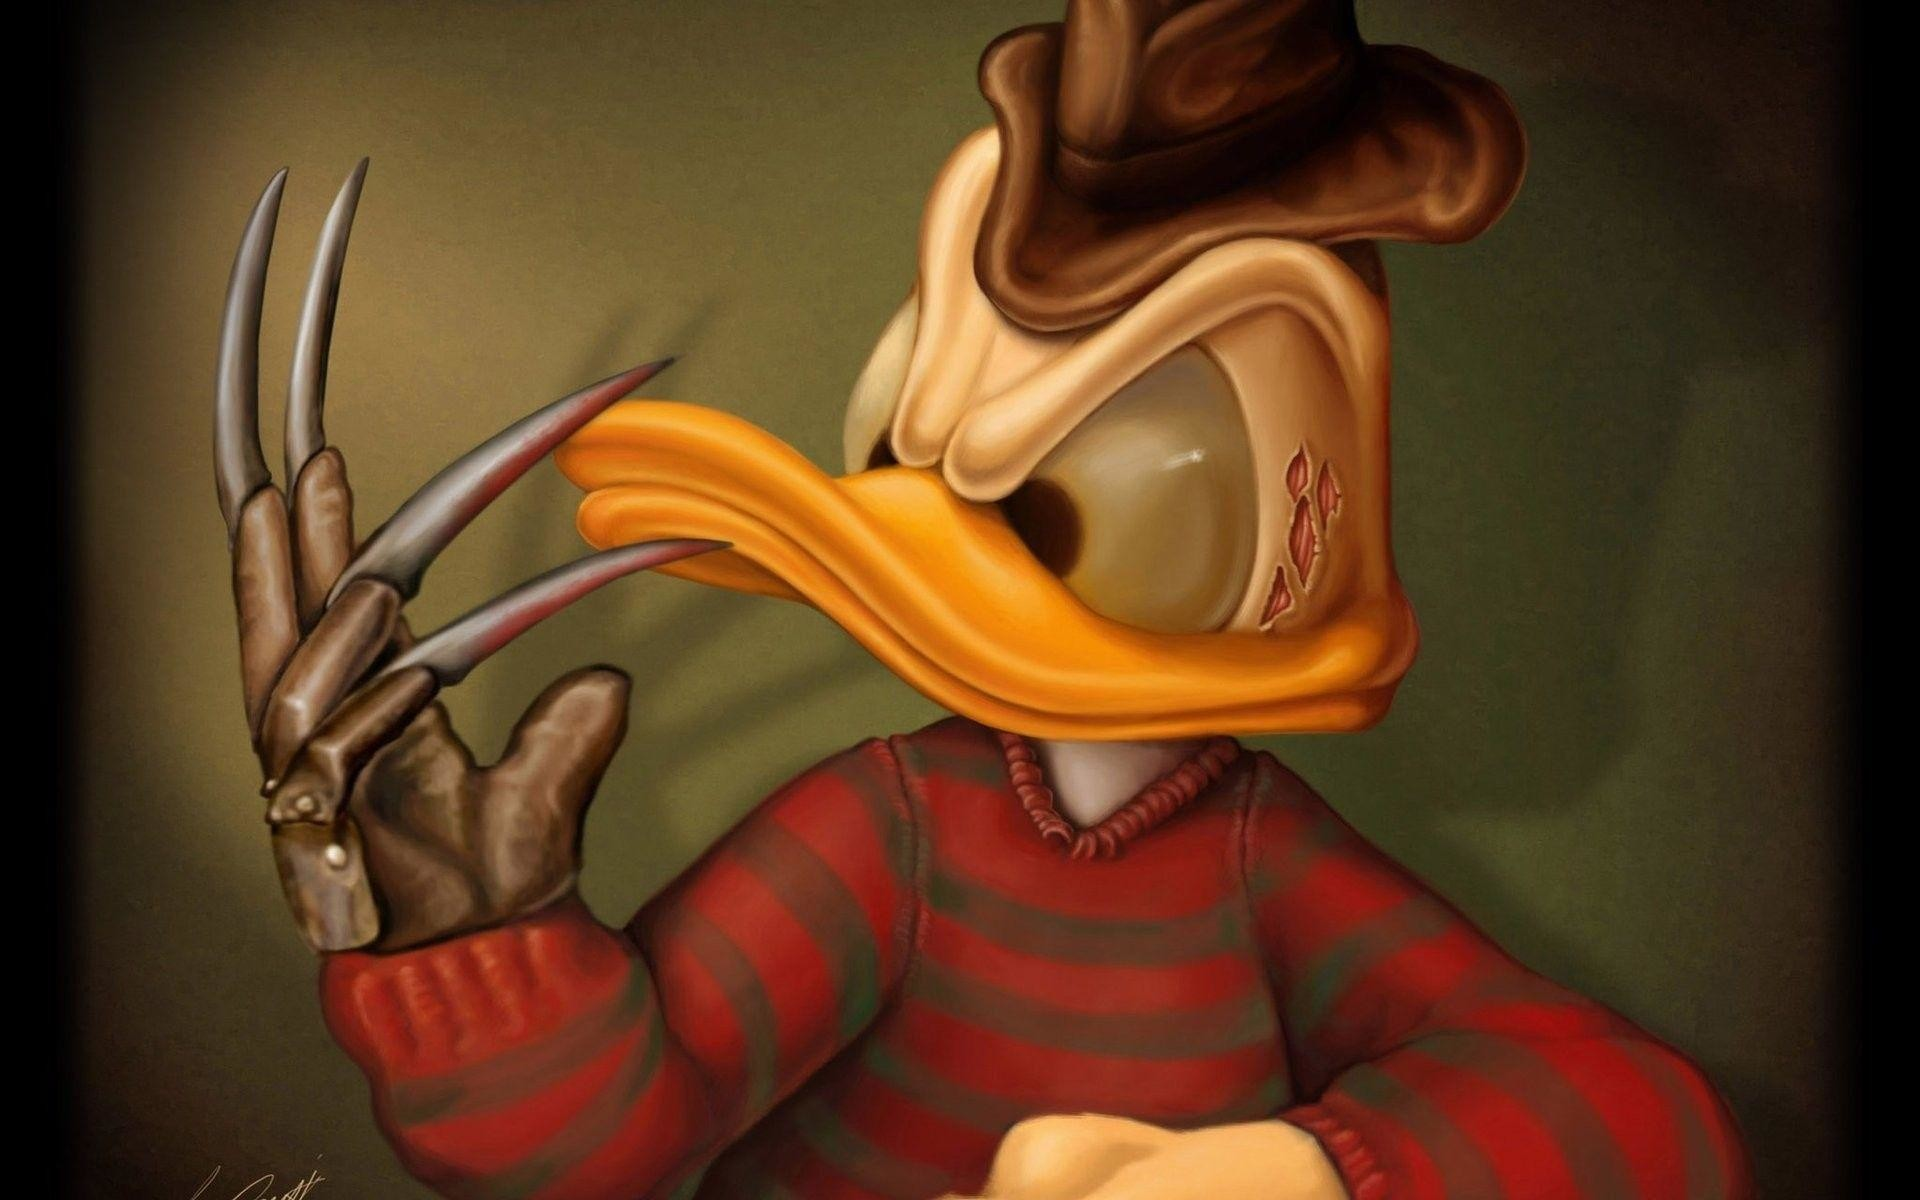 Donald Duck as Freddy Krueger Exclusive HD Wallpapers